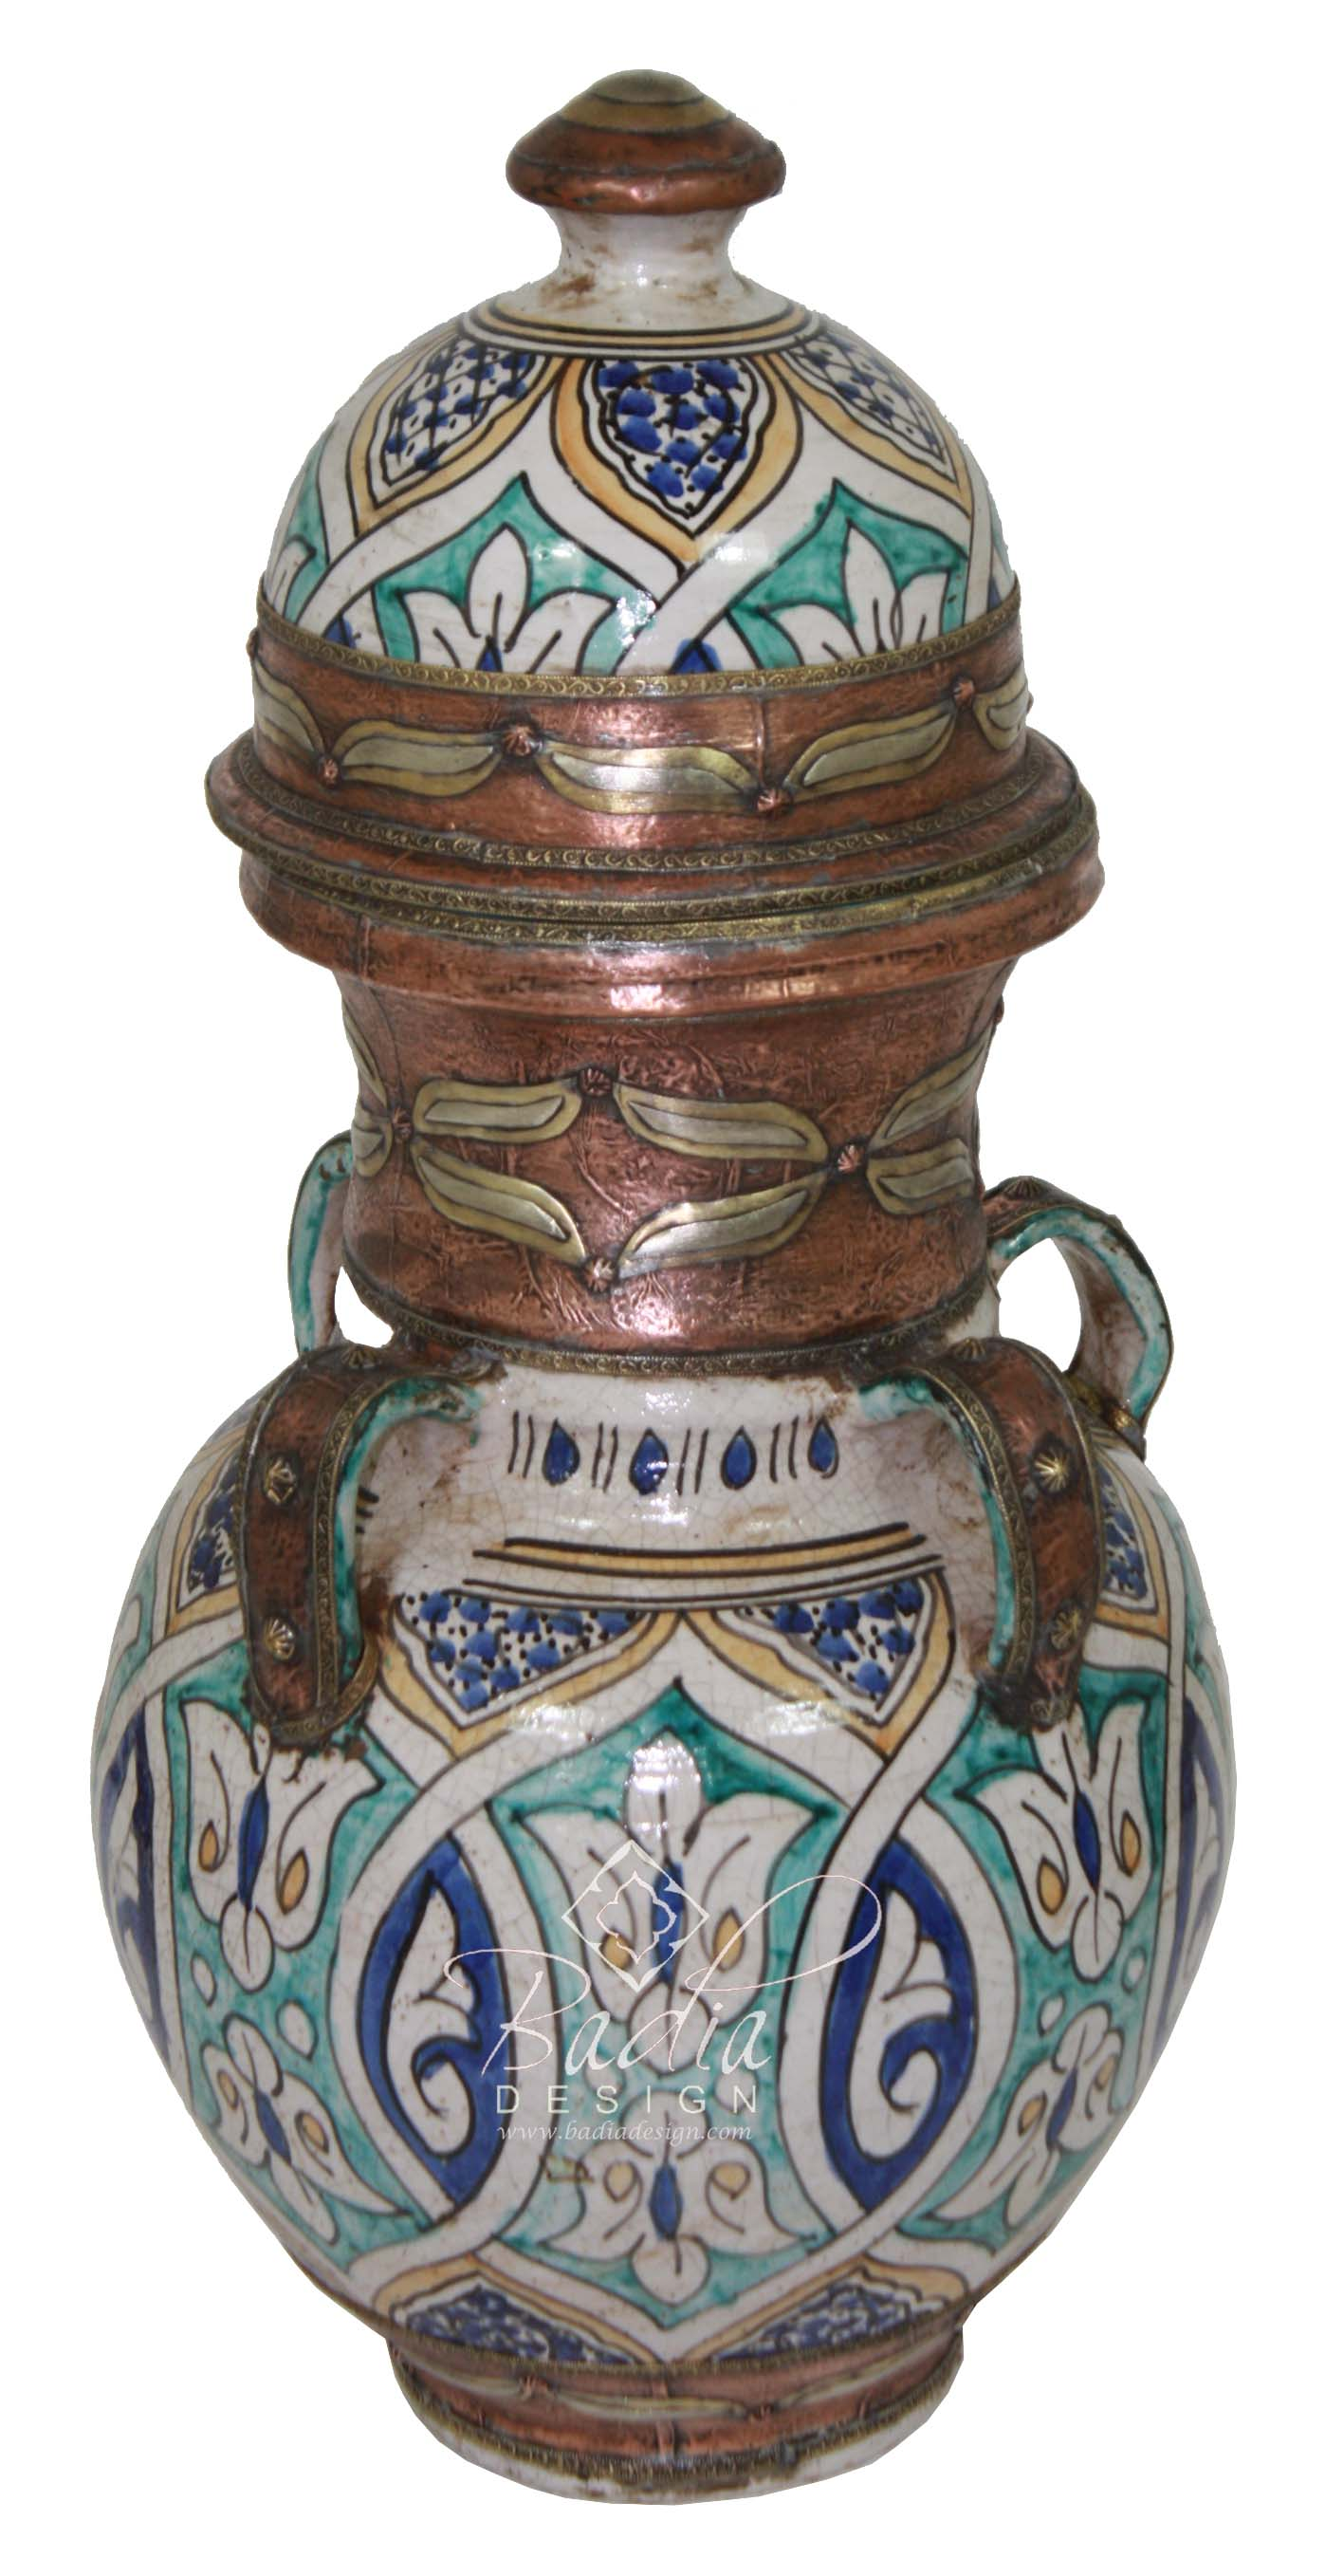 small-hand-painted-metal-and-ceramic-urn-va085.jpg